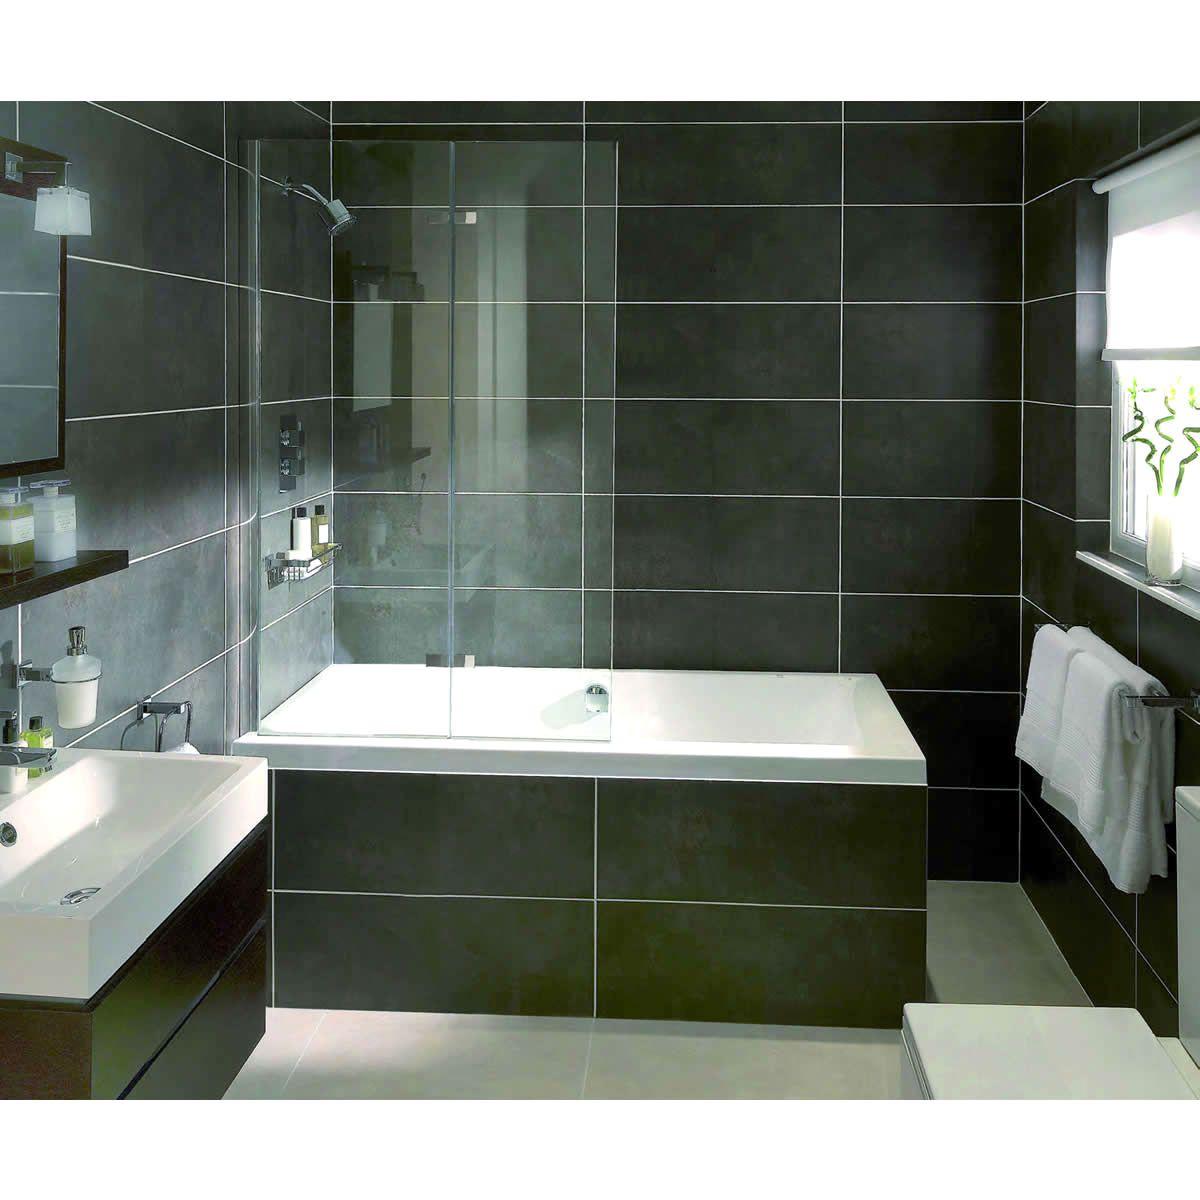 aqata spectra folding bath screen sp490 uk bathrooms aqata spectra folding bath screen sp490